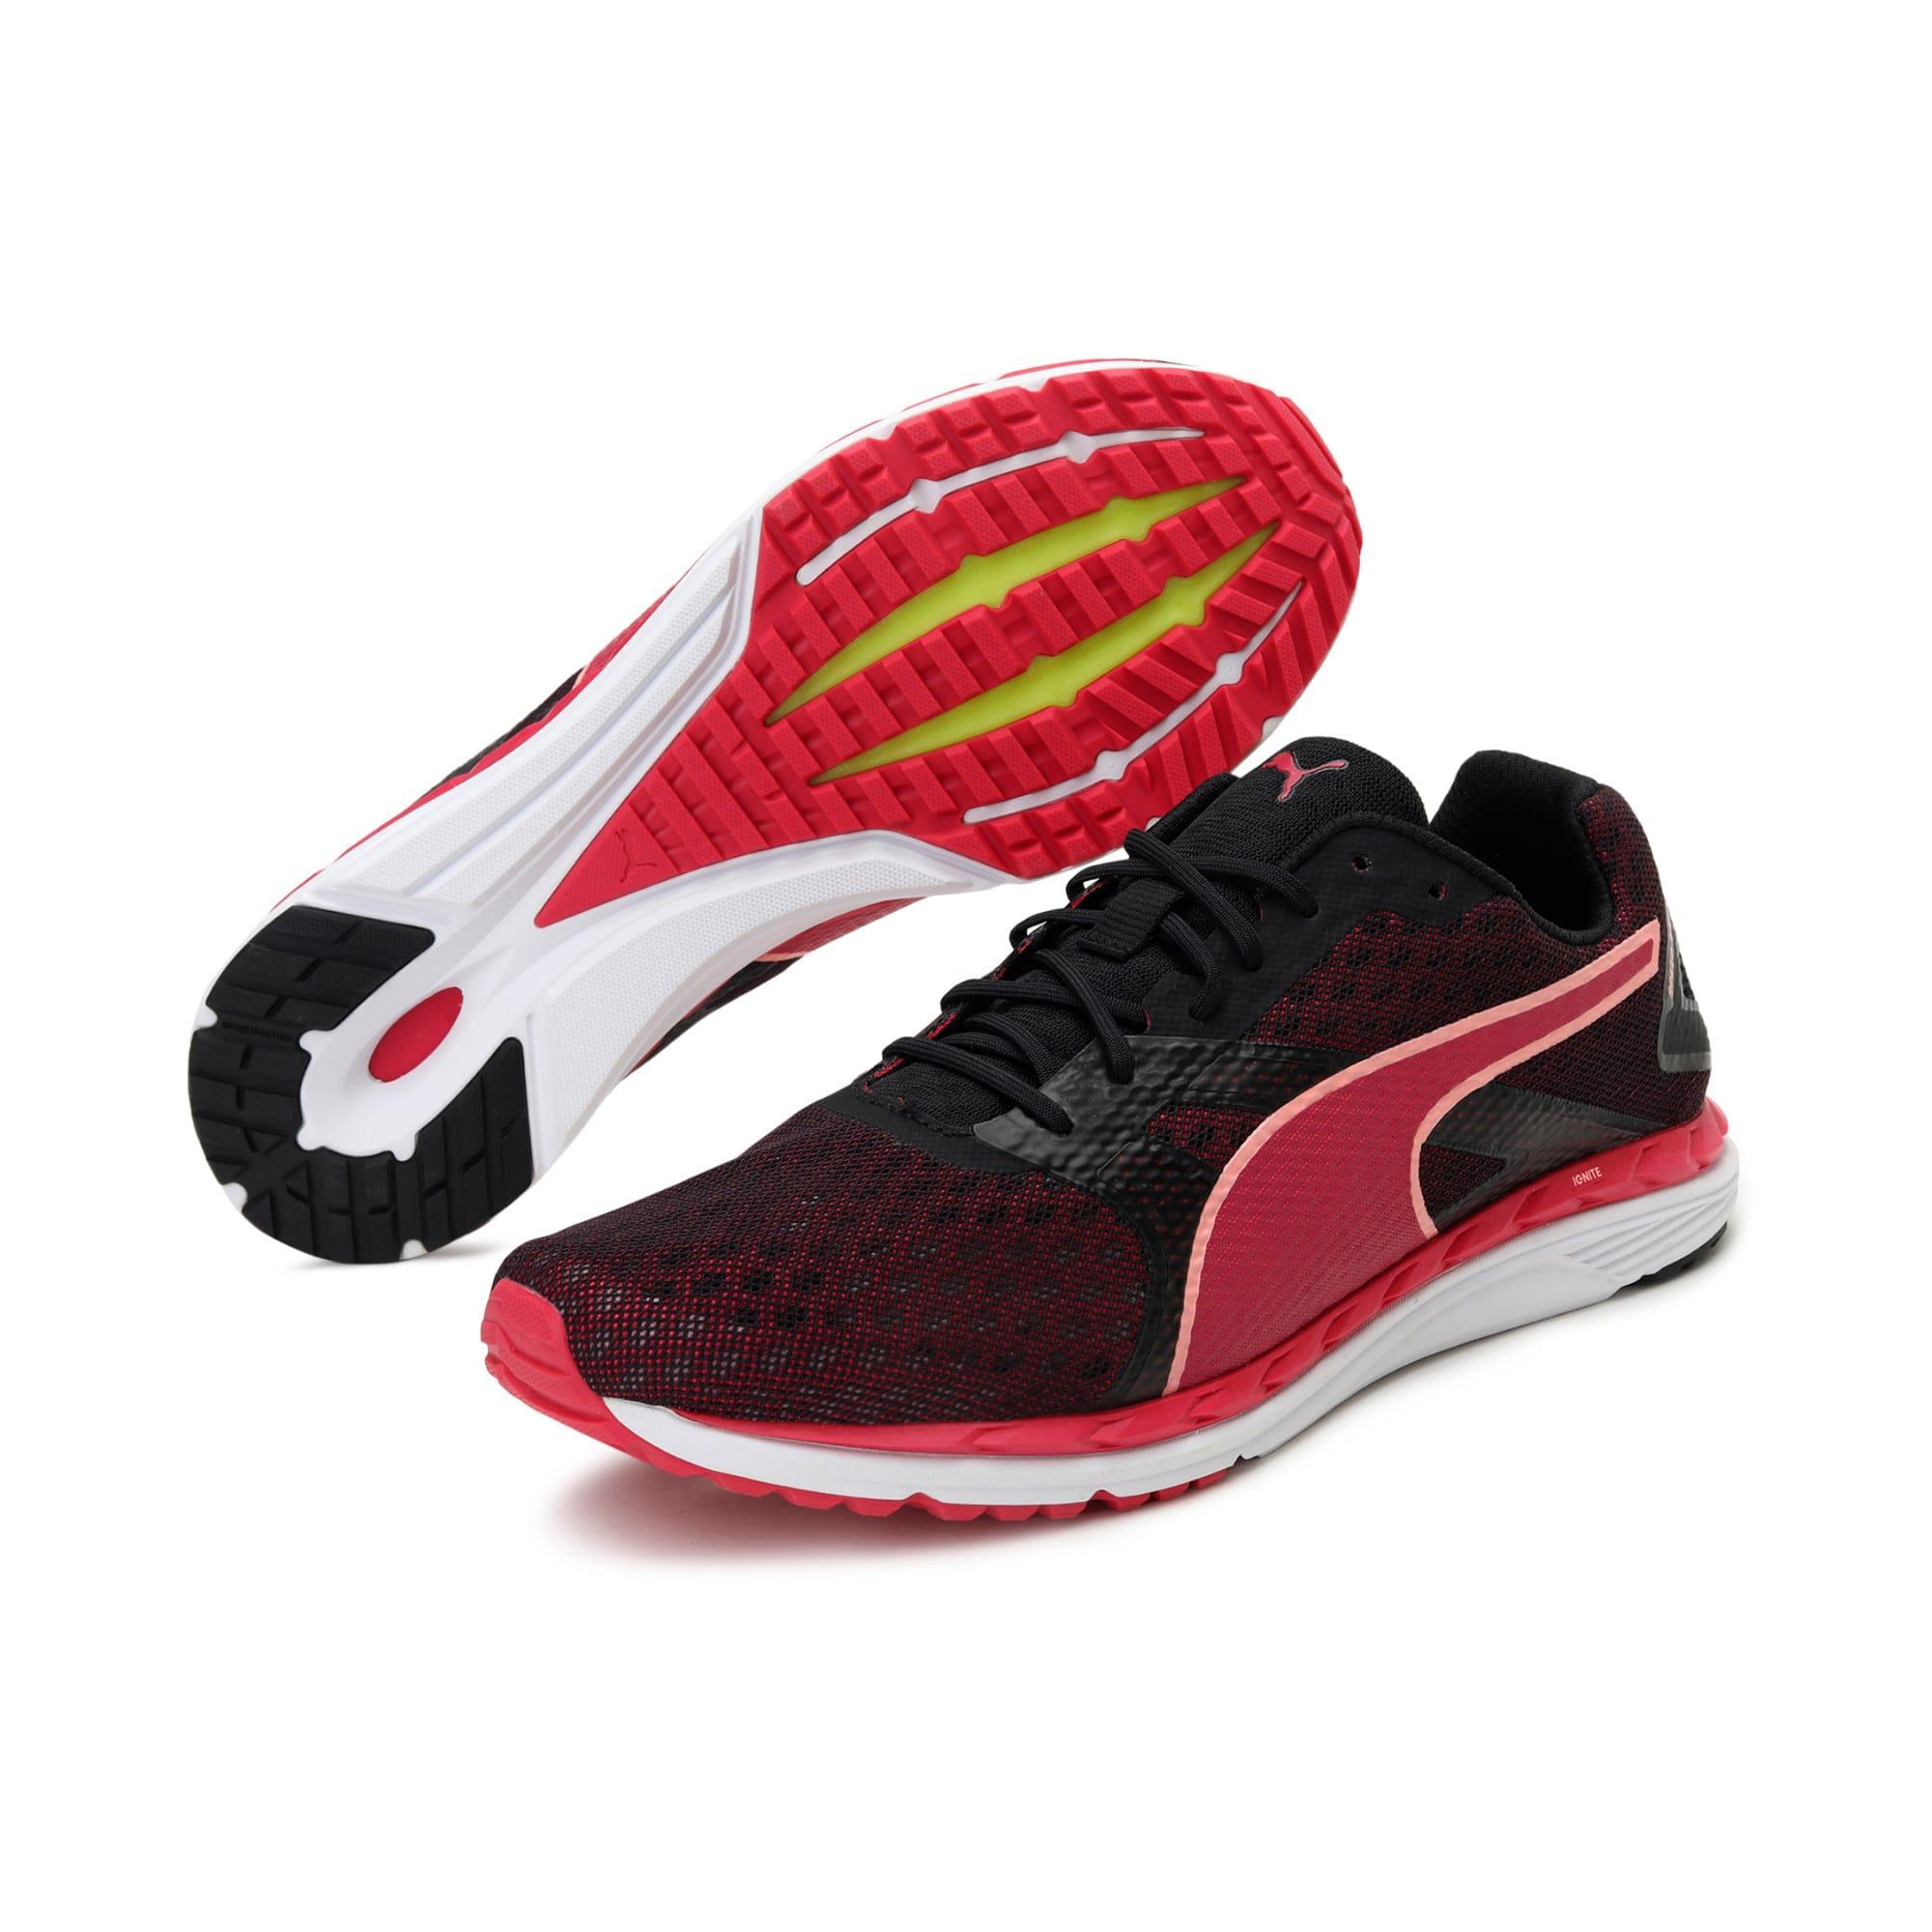 Thumbnail 2 of Speed 300 IGNITE 2 Women's Running Shoes, Love Potion-Puma Black, medium-IND